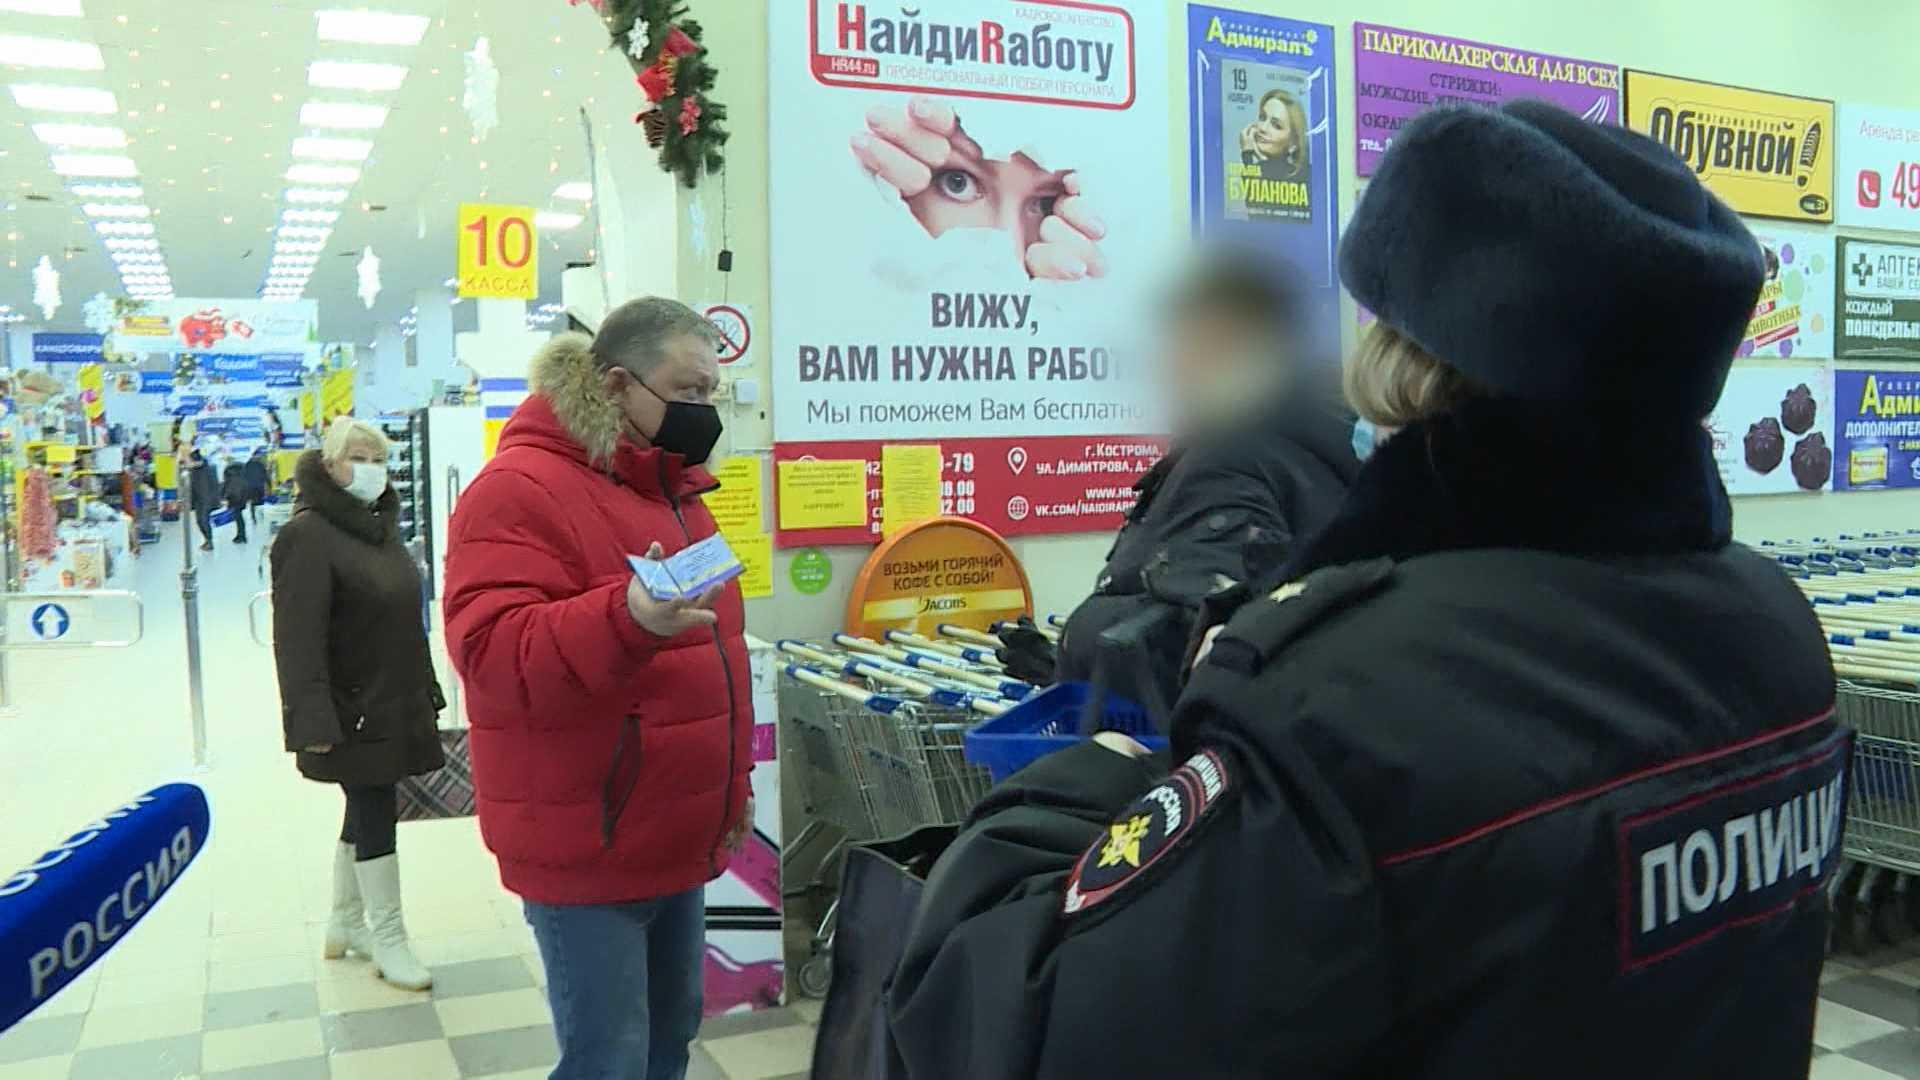 Ковид-диссиденты в Костроме дорого платят за браваду